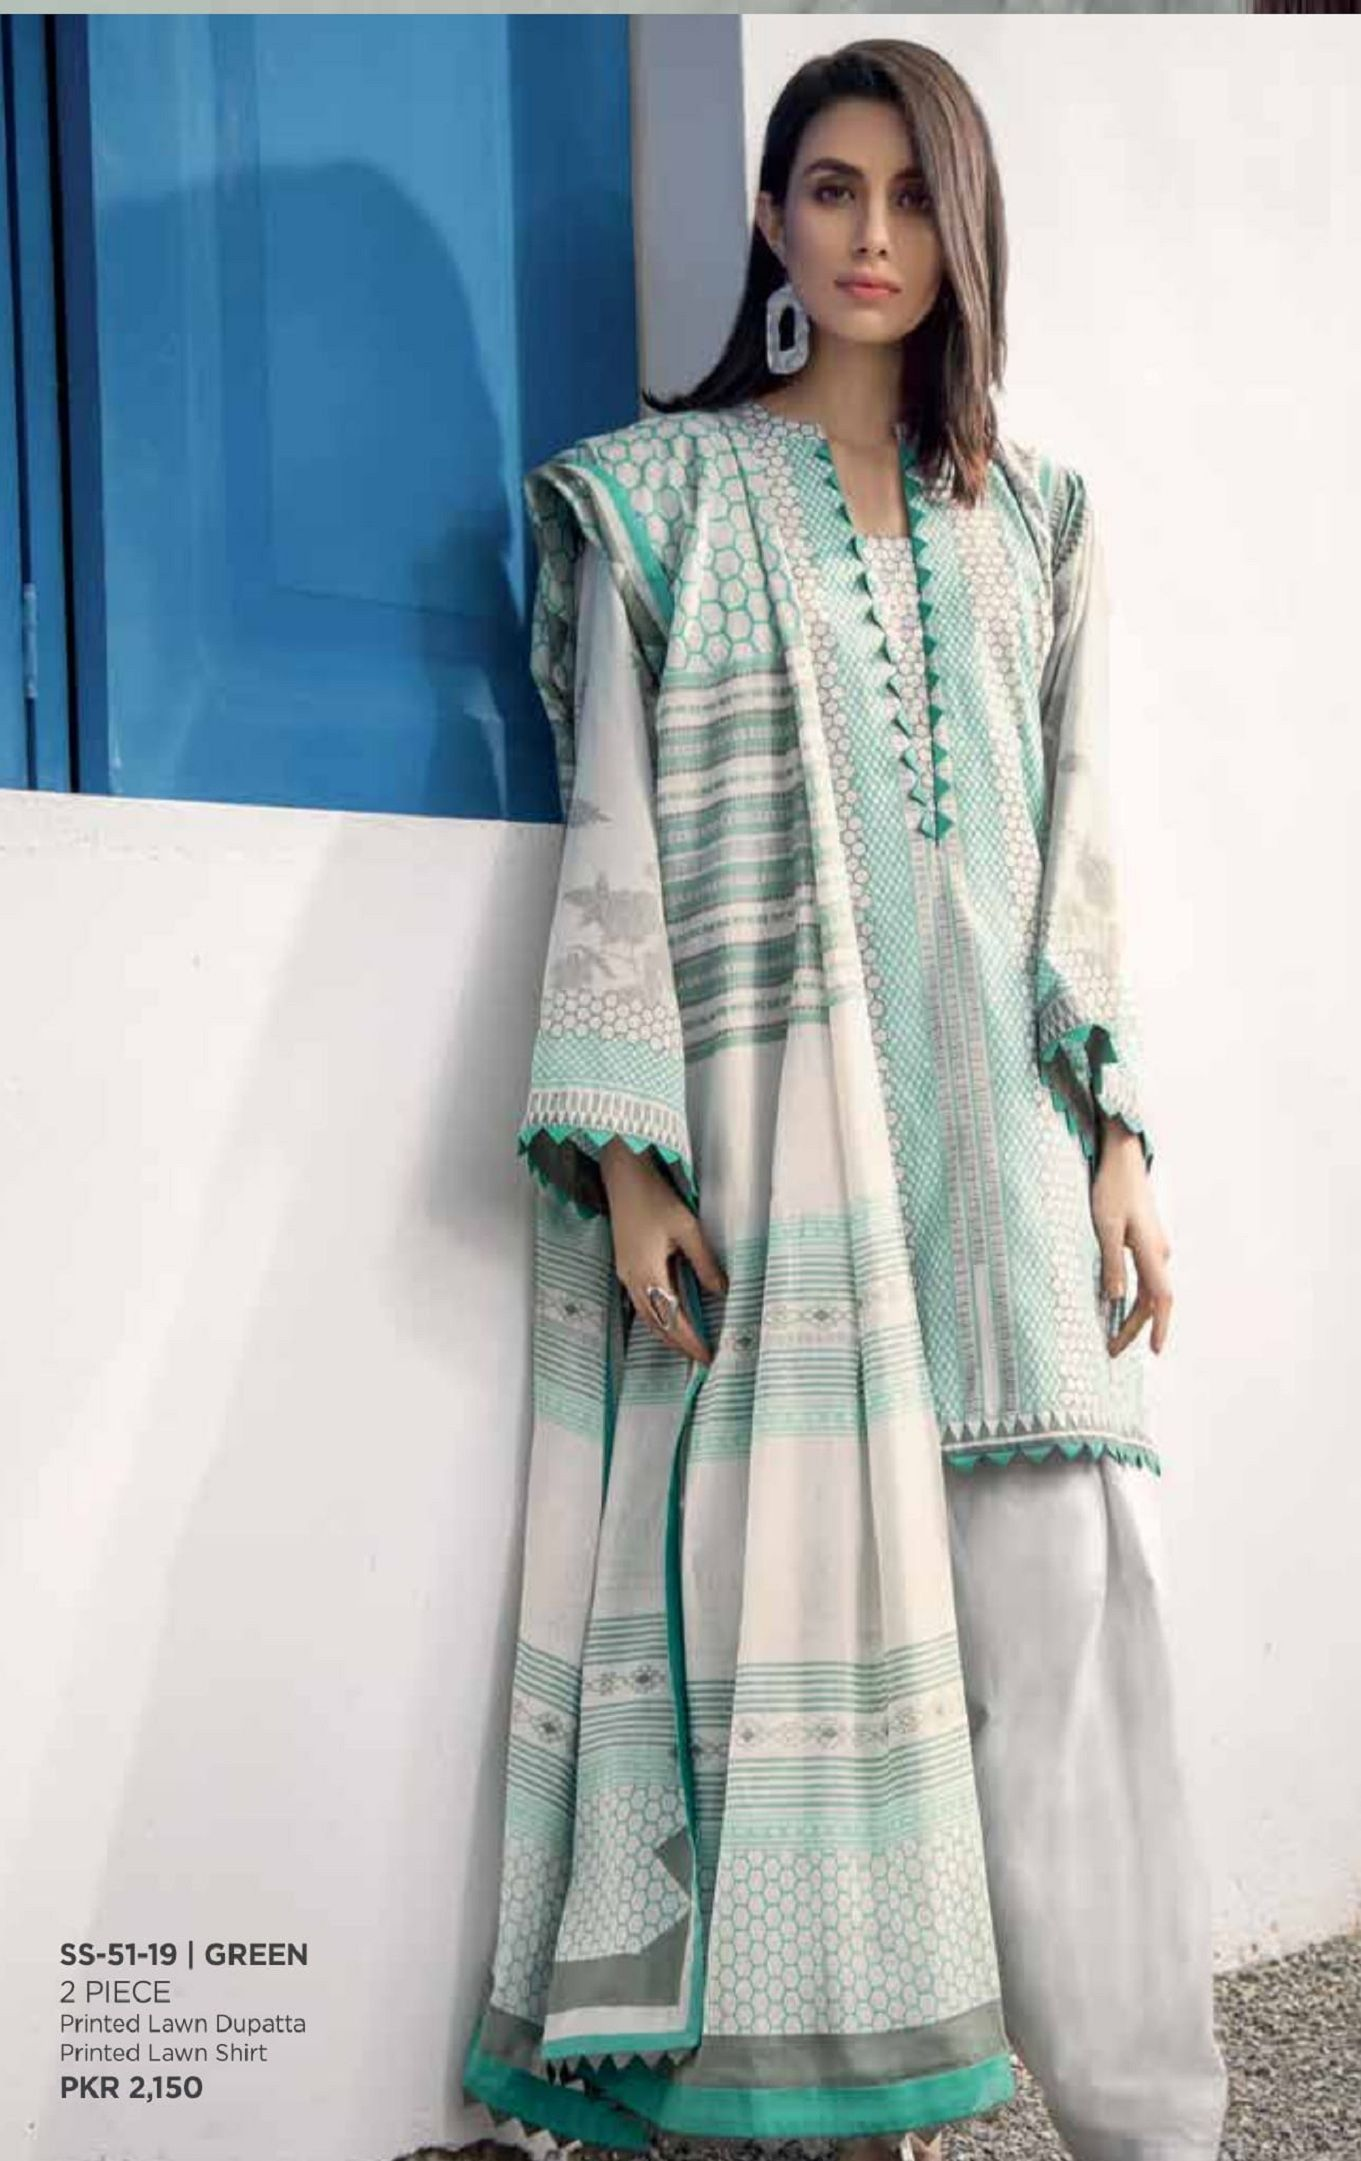 66306ad76f Alkaram Spring Summer Collection Original Pakistani Suit SS-51-19 (Green)